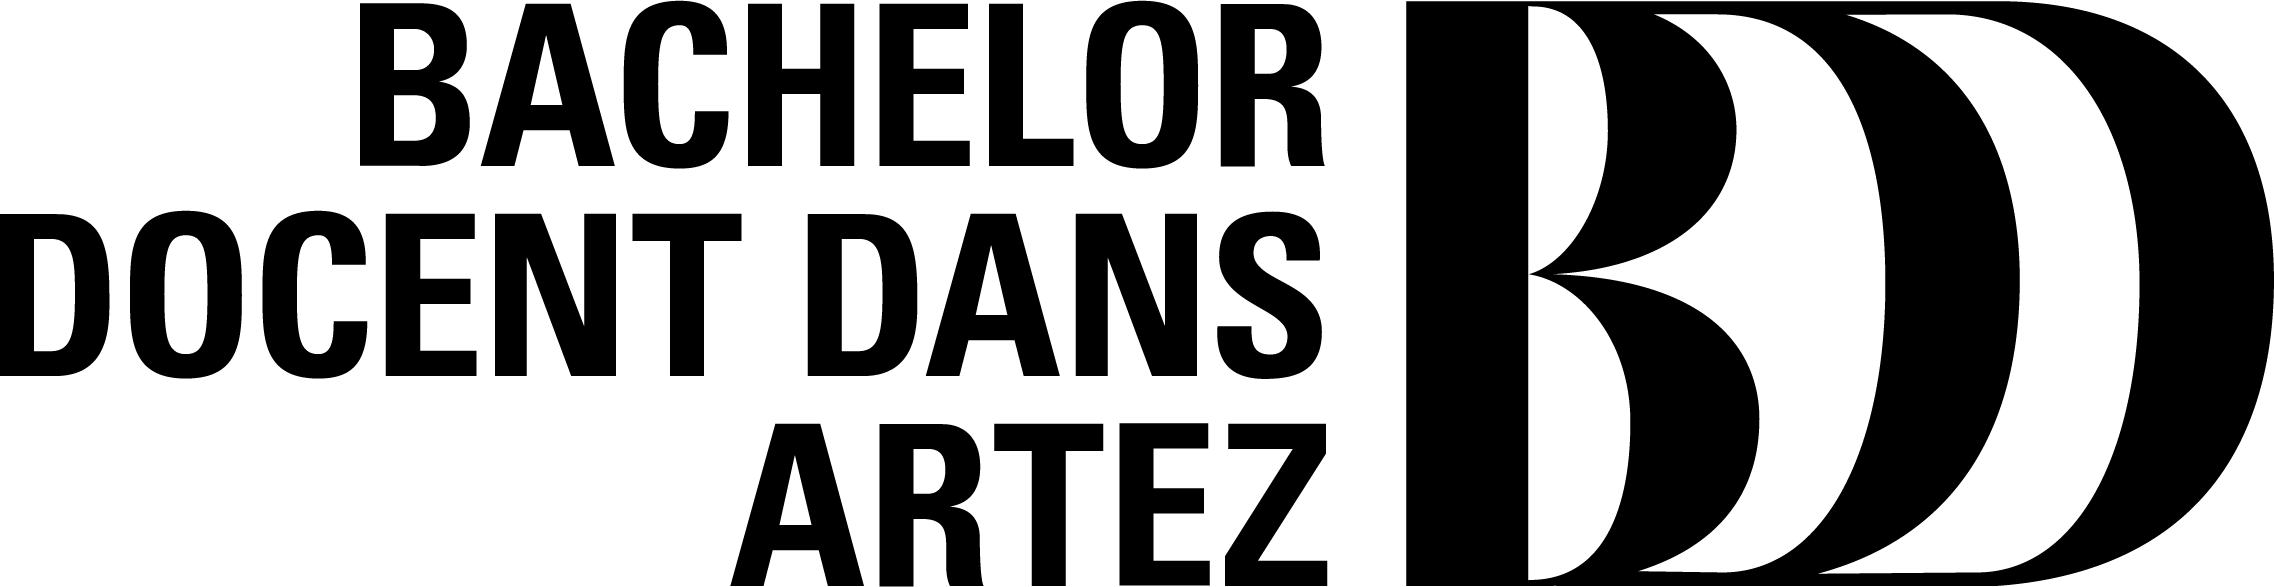 logo Artez bachelor docent dans